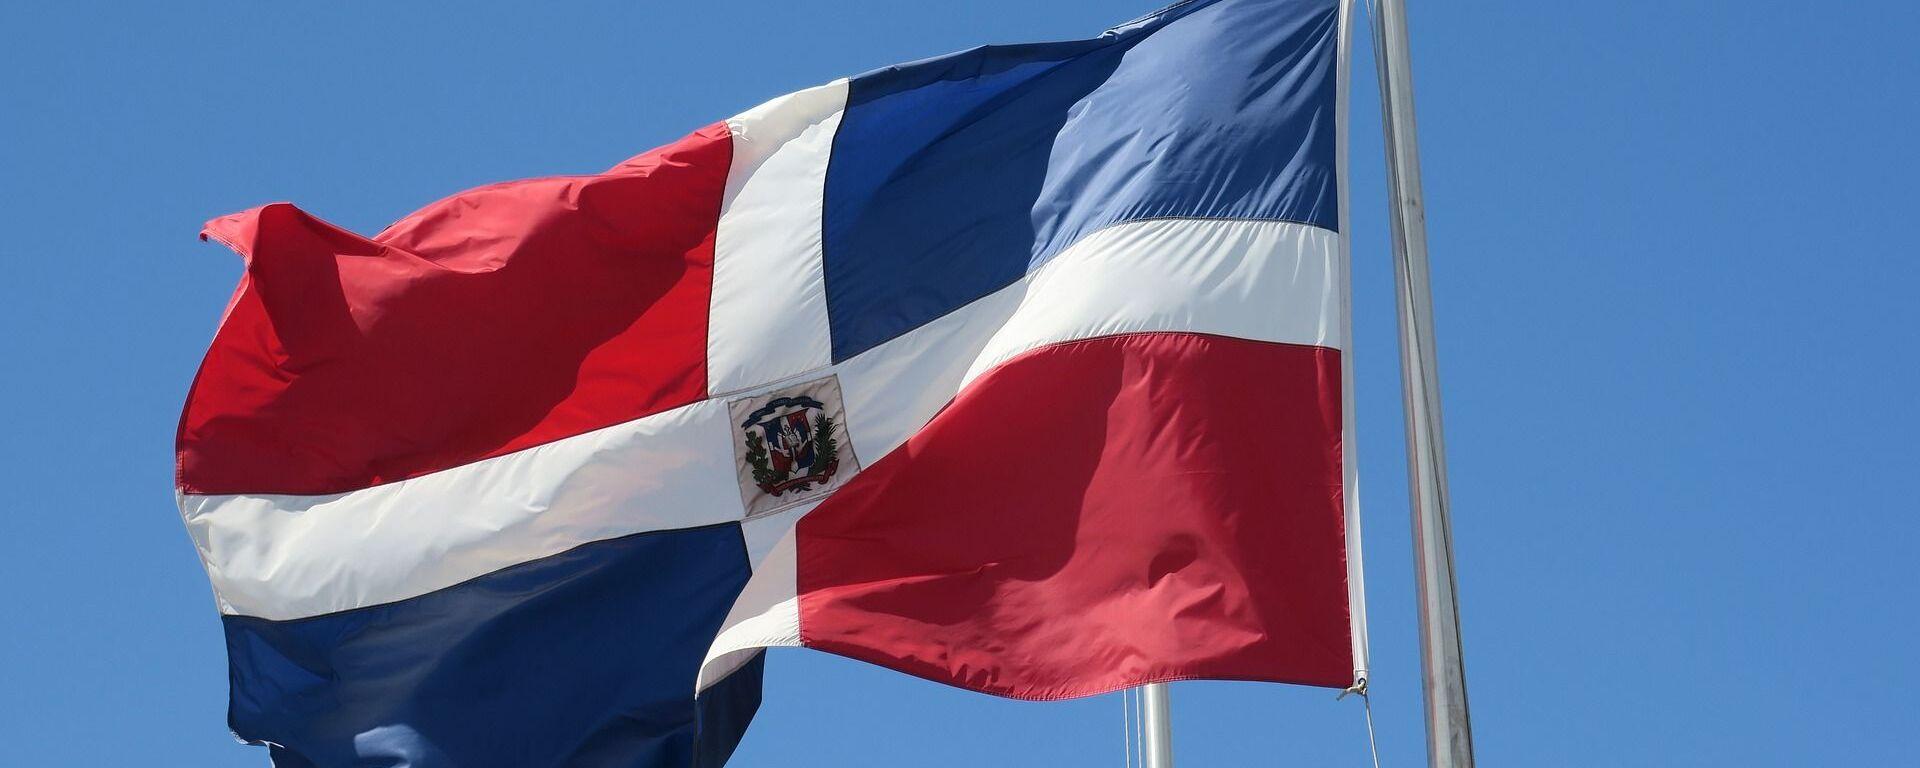 La bandera de la República Dominicana - Sputnik Mundo, 1920, 20.05.2021